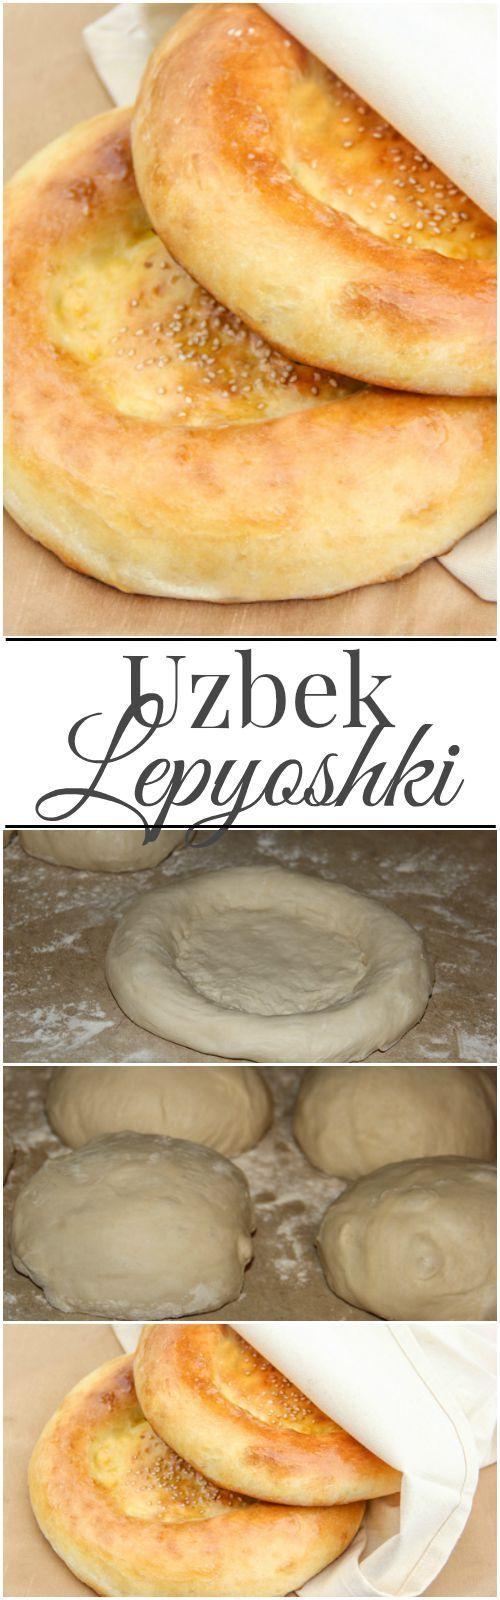 Uzbek Lepyoski. ValentinasCorner.com